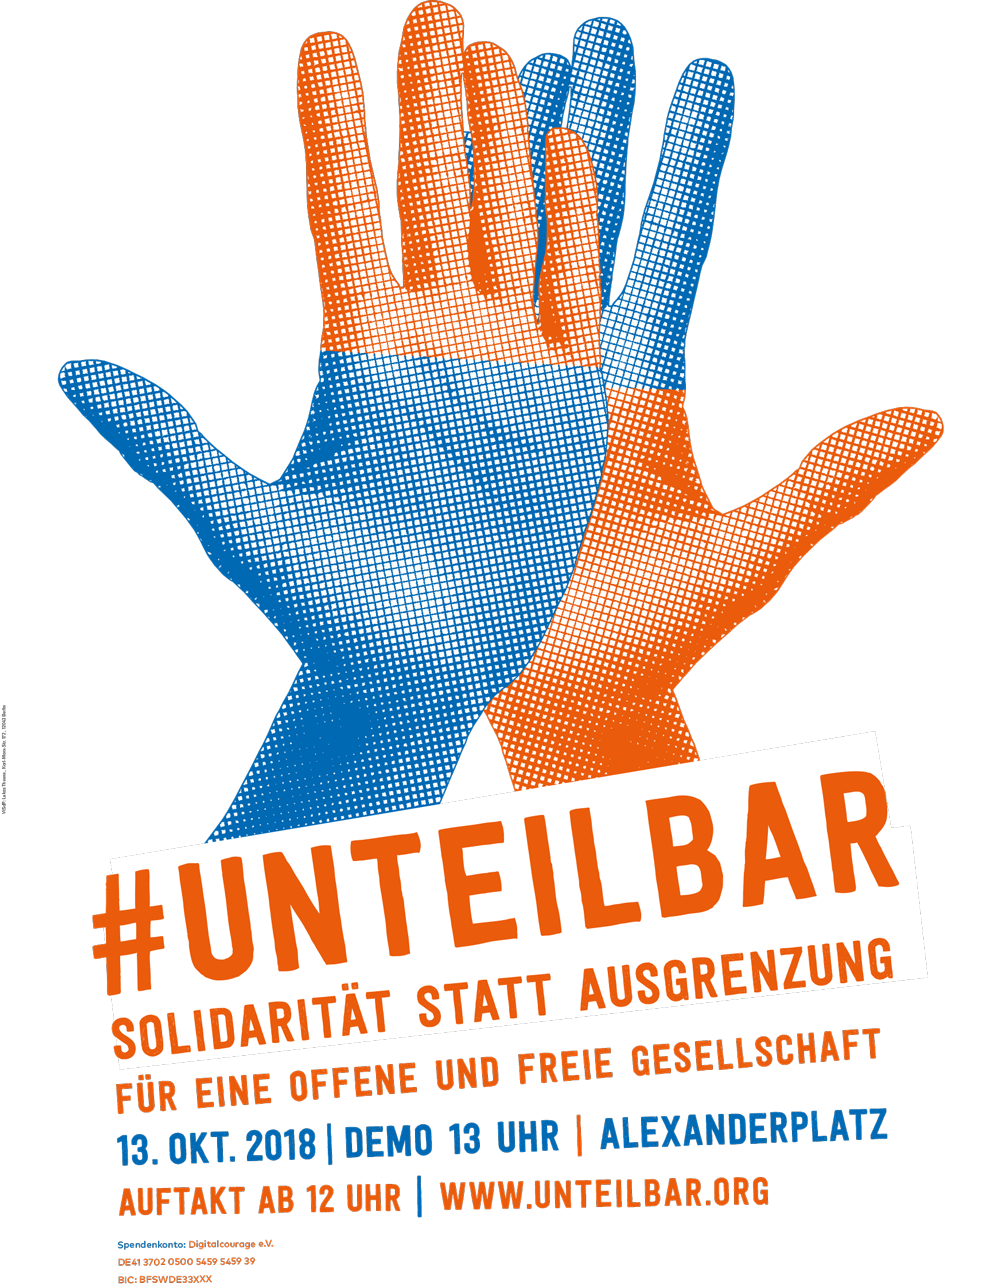 #unteilbar - Solidarität statt Ausgrenzung @ Alexanderplatz